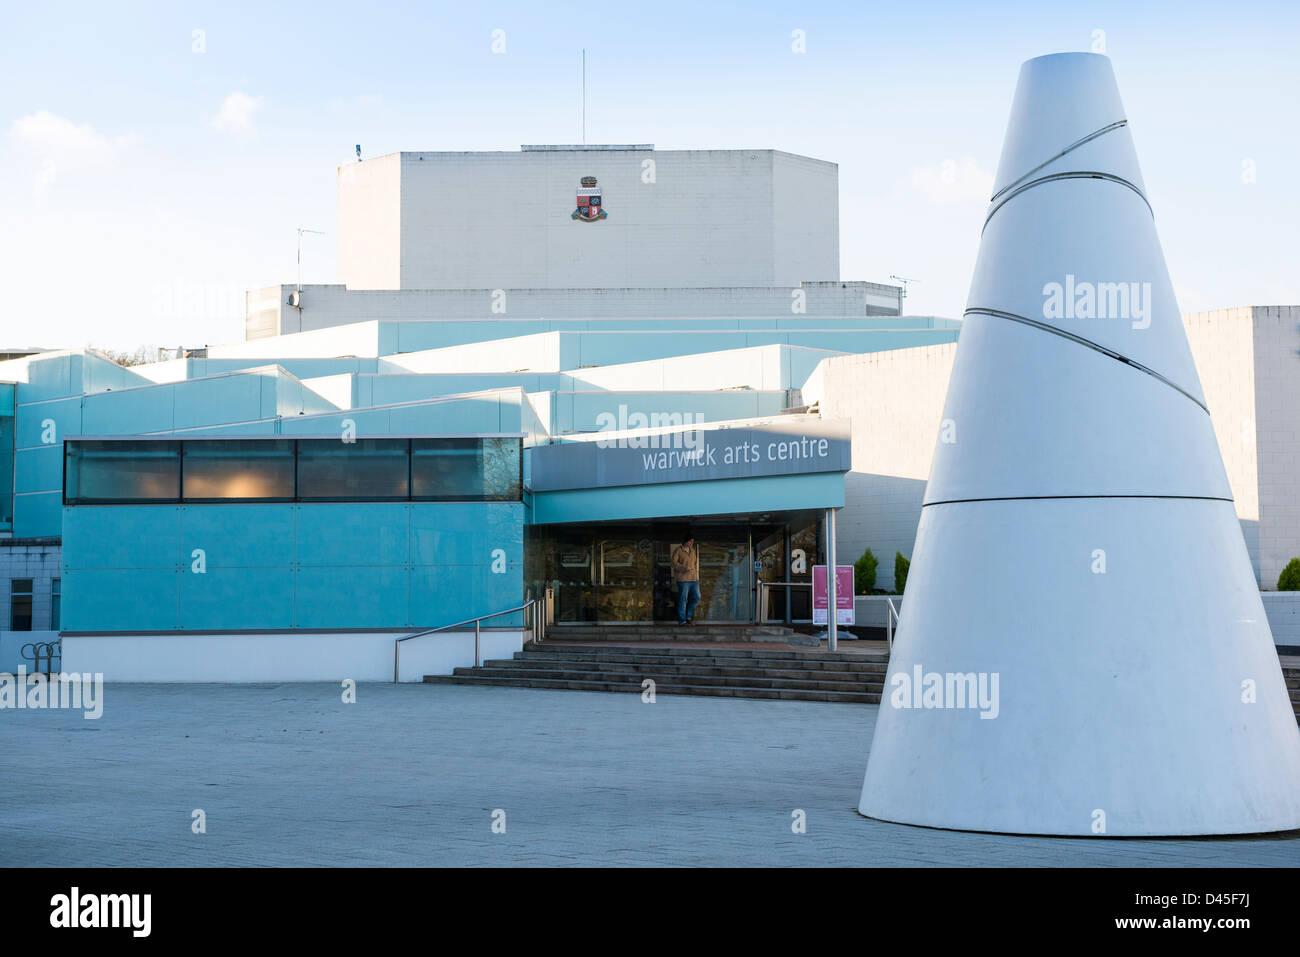 Warwick Arts Centre, at Warwick University - Stock Image